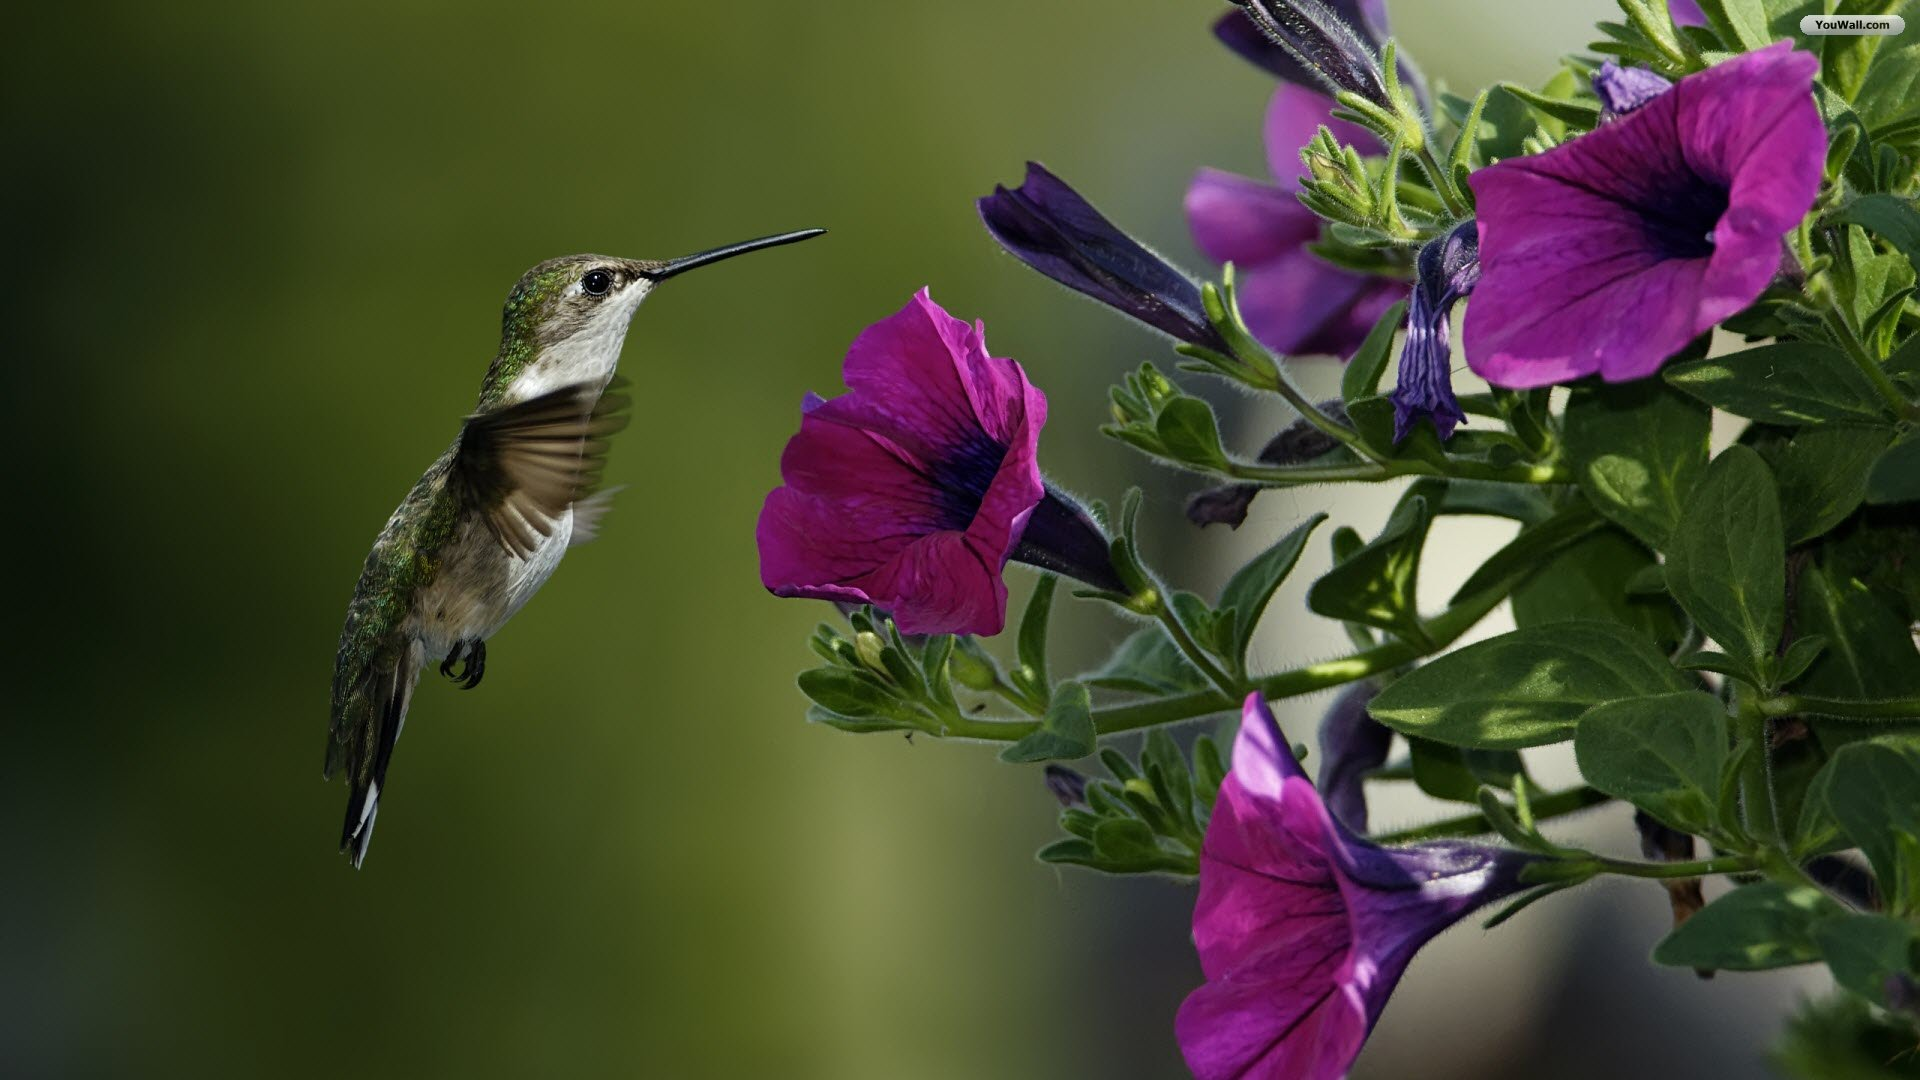 44 Birds 1080p Wallpaper On Wallpapersafari